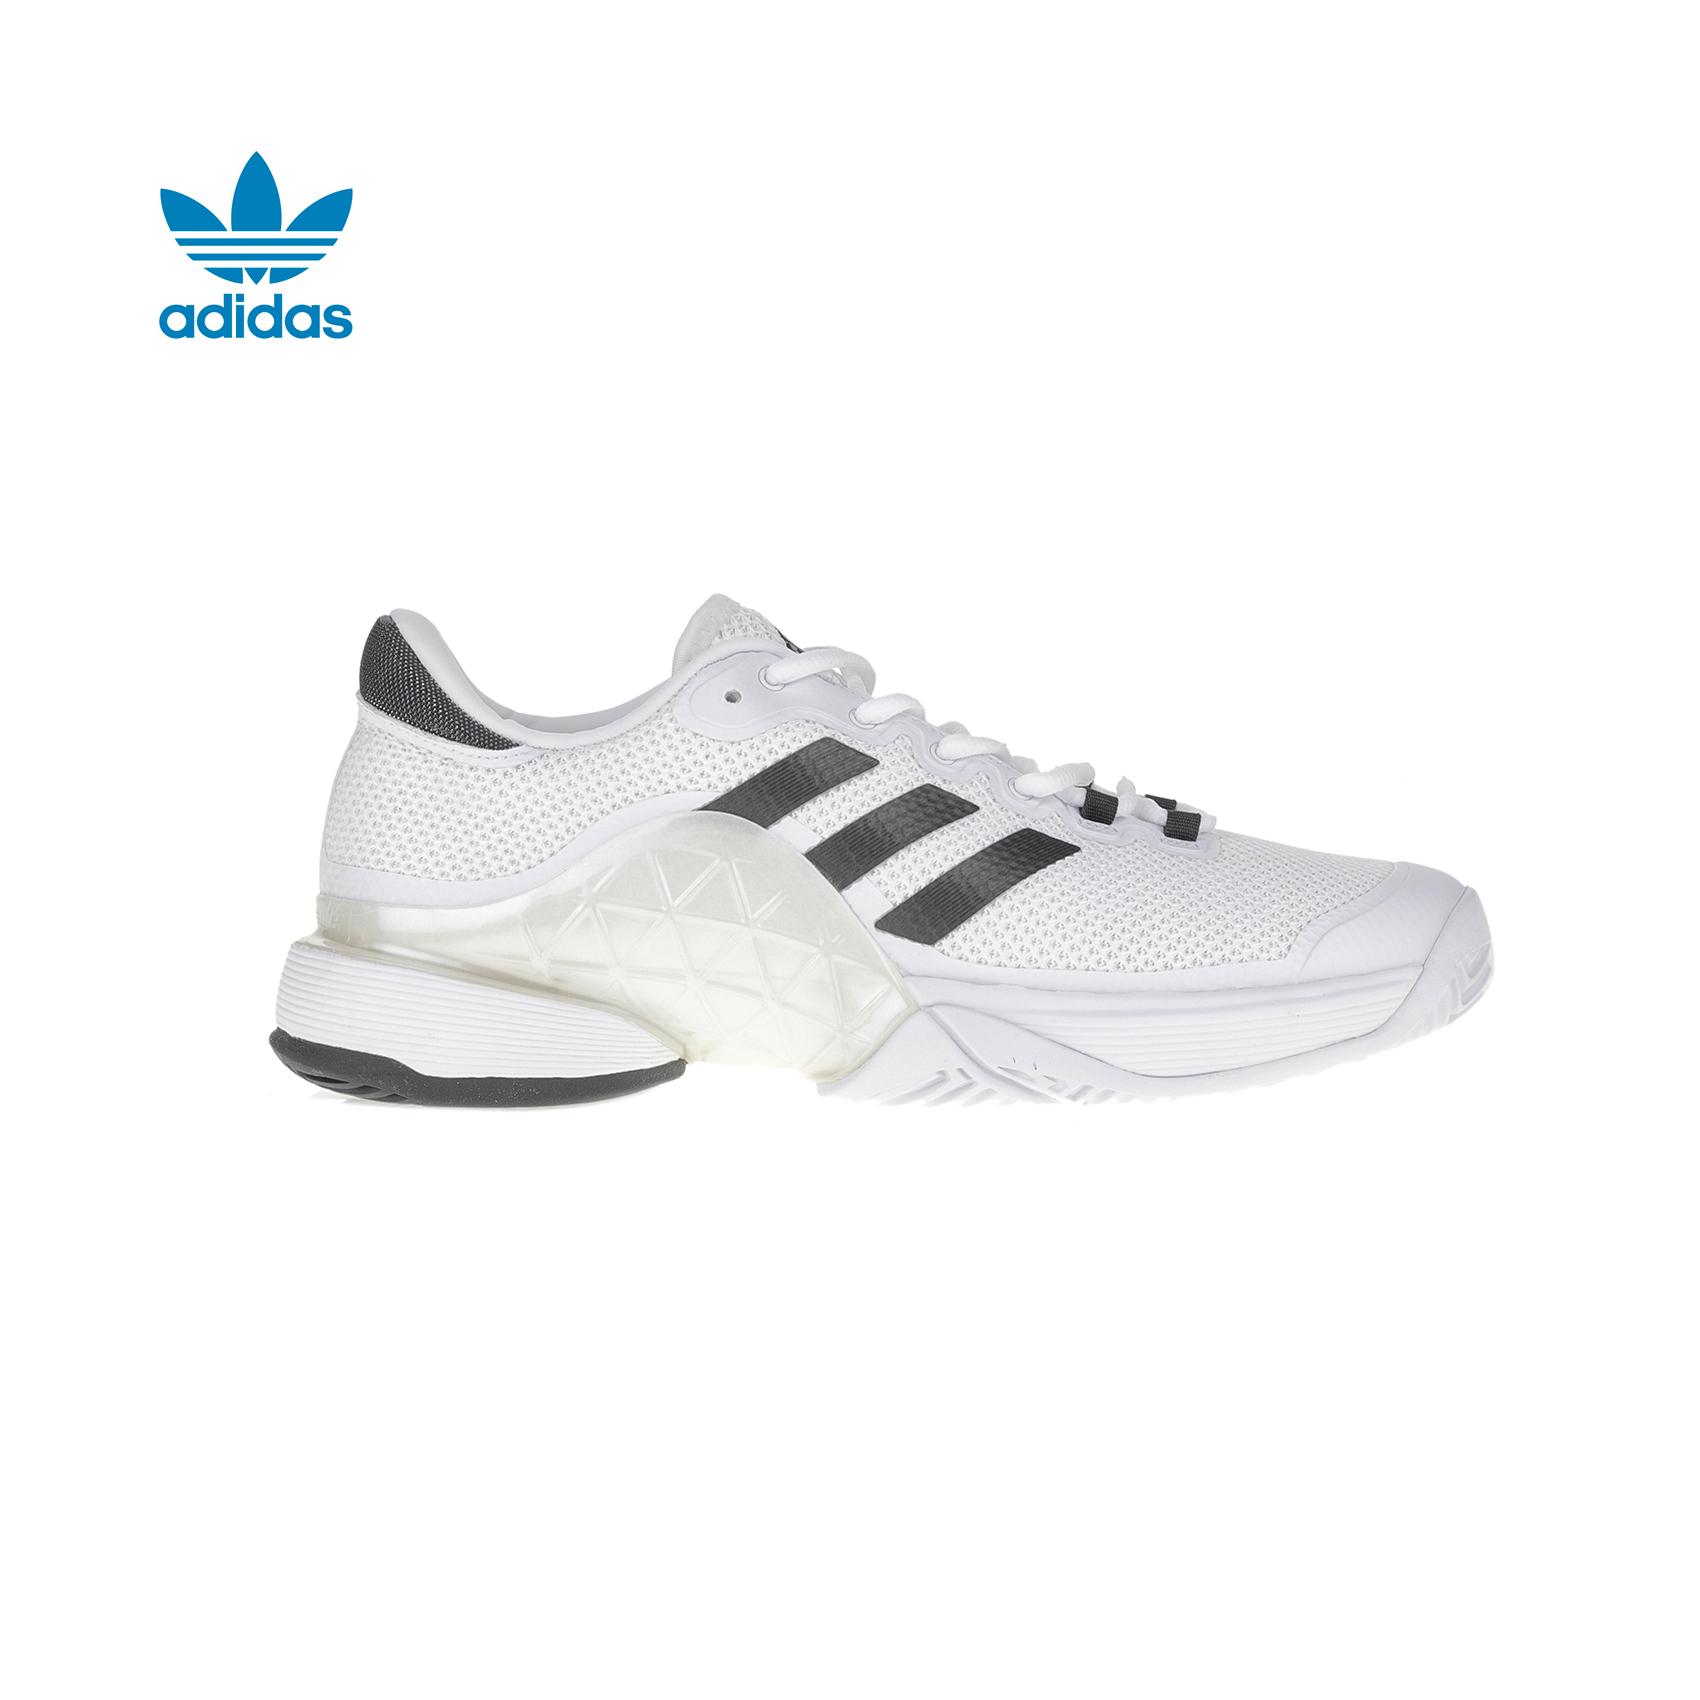 adidas Originals – Ανδρικά παούτσια τένις adidas Barricade 2017 λευκά